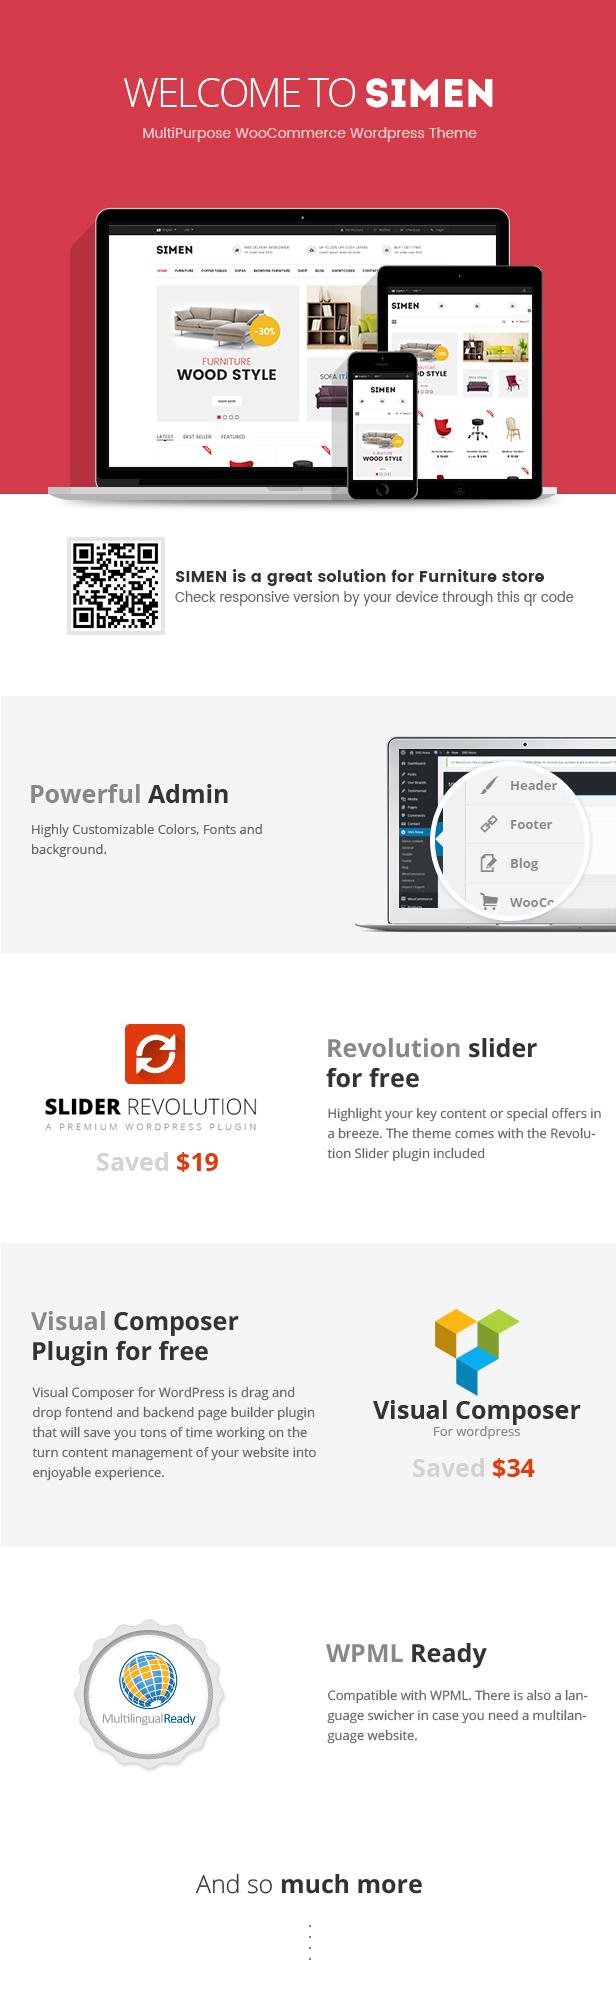 Simen - MultiPurpose WooCommerce WordPress Theme - 1